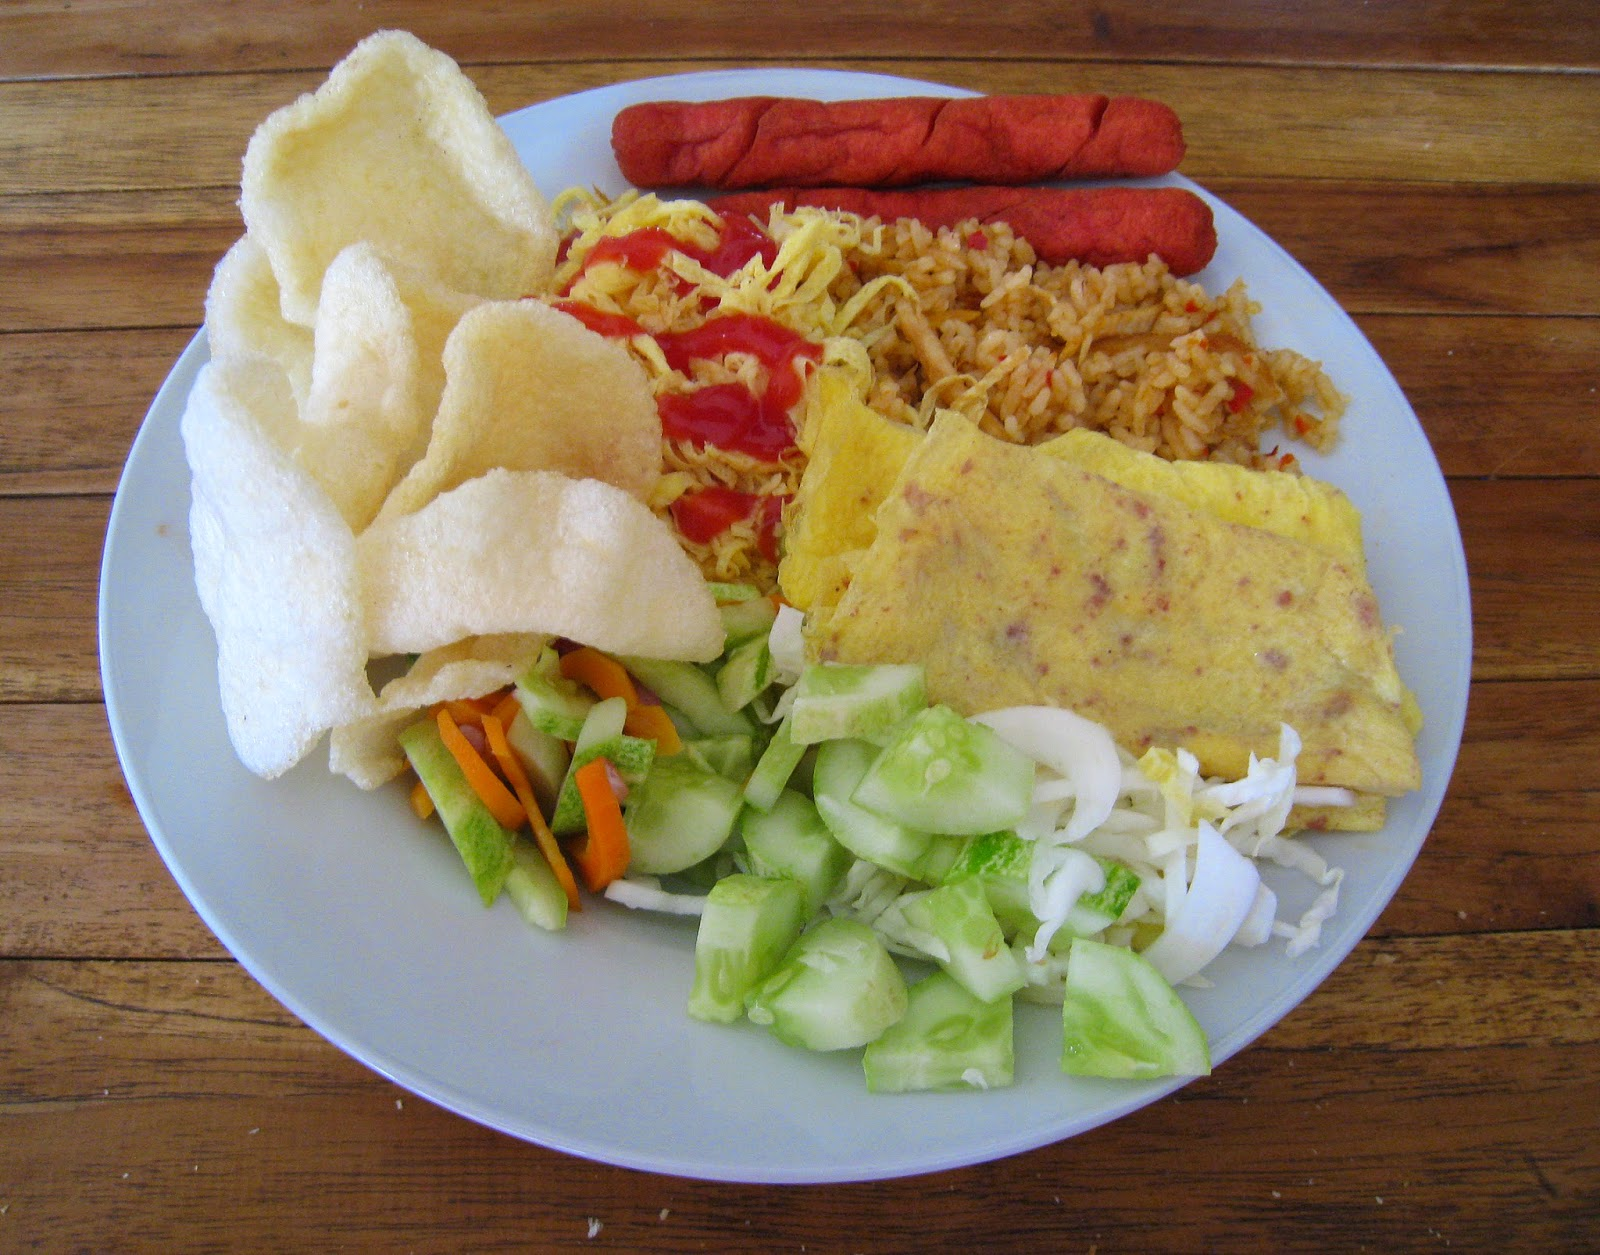 Resep Nasi Goreng Babat Jawa Asli Aneka Resep Masakan